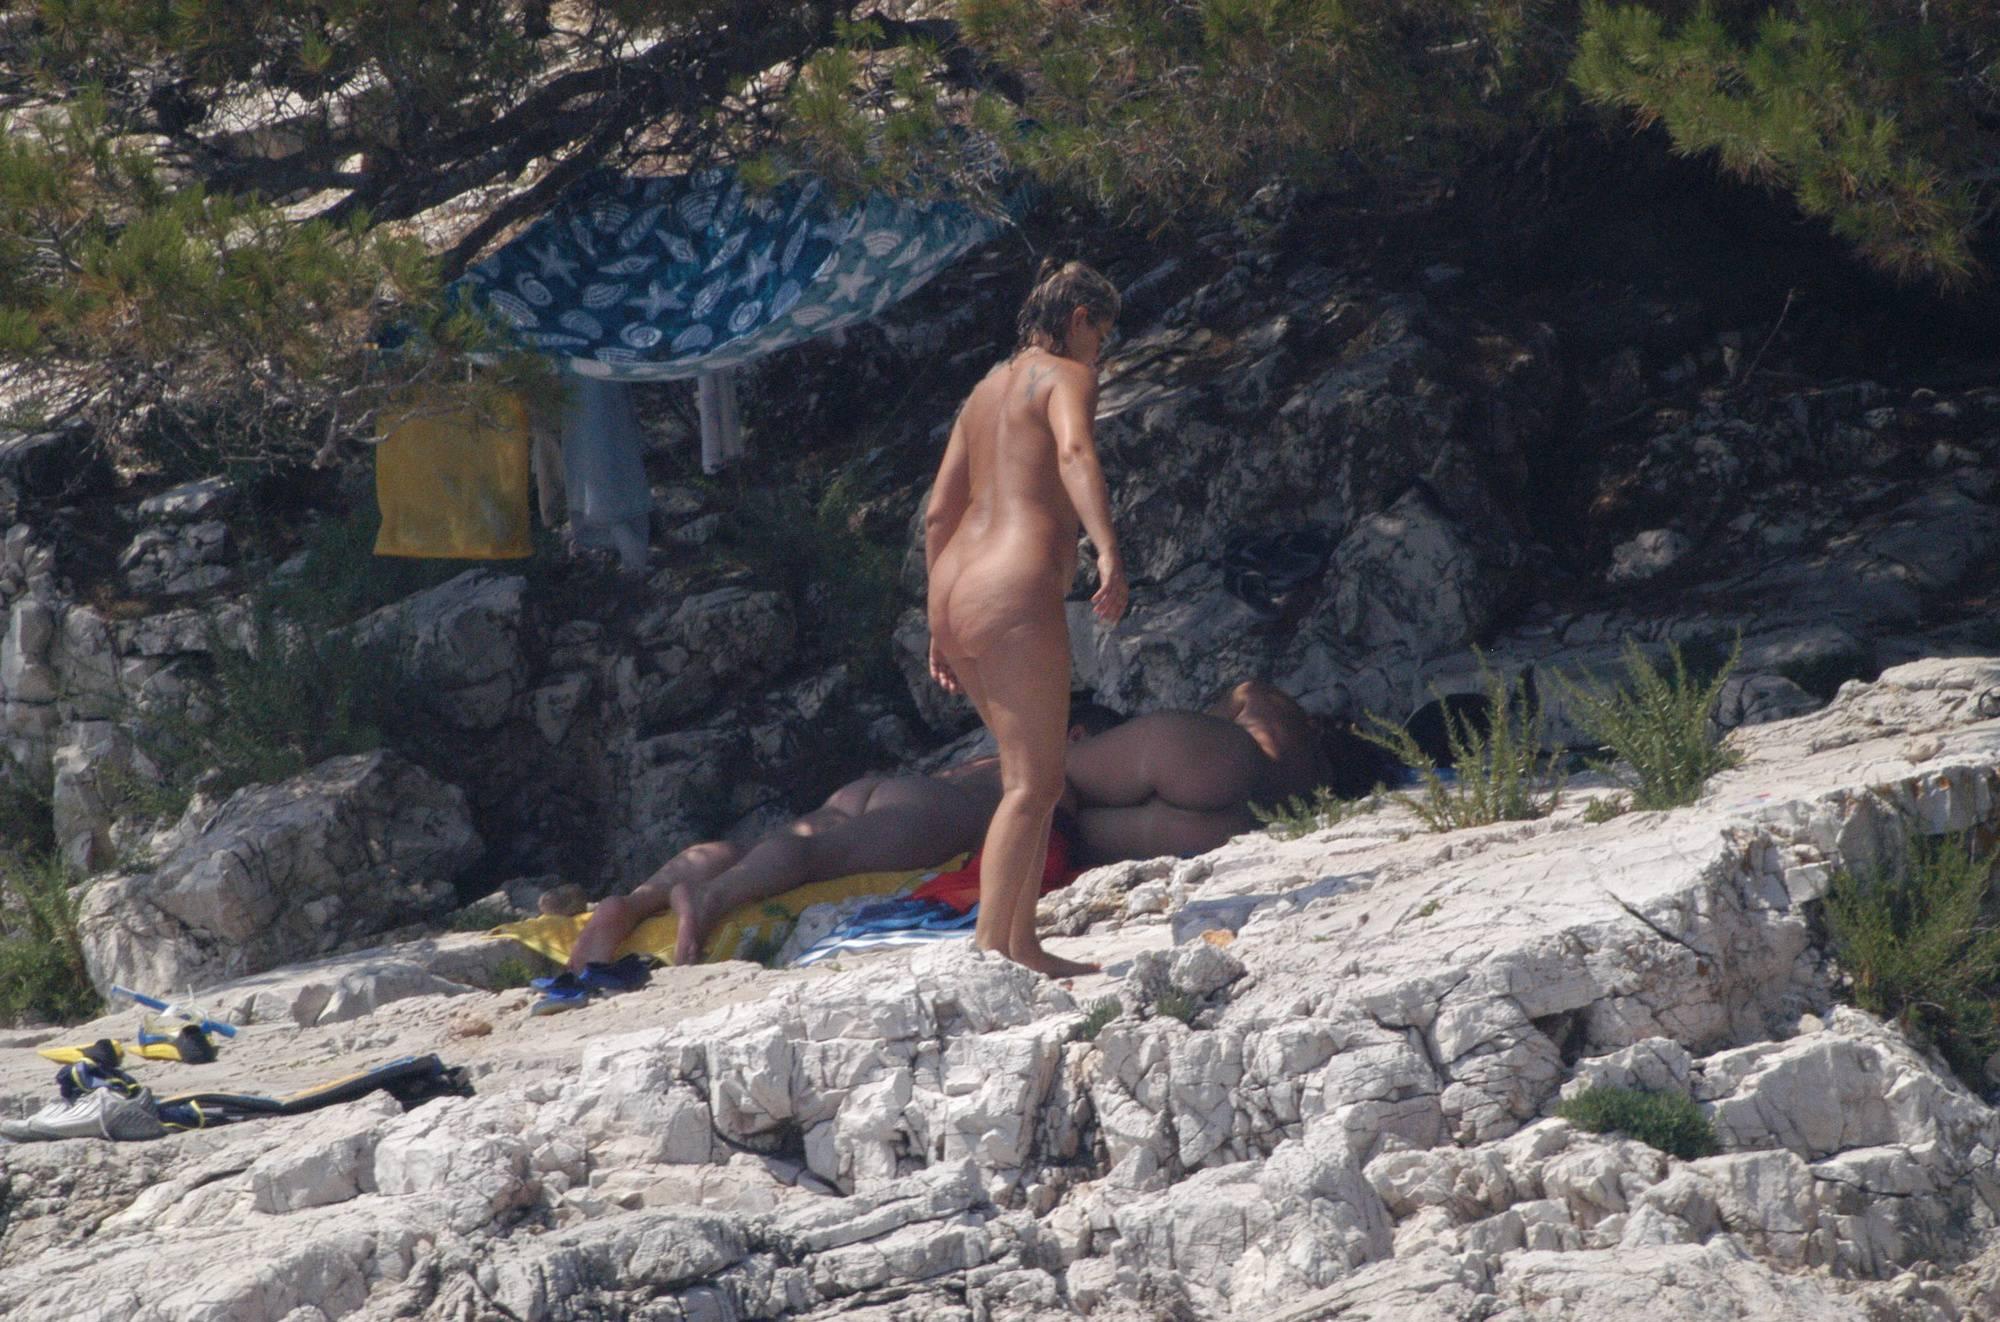 Nudist Photos Croatian Rock-Front Coast - 1